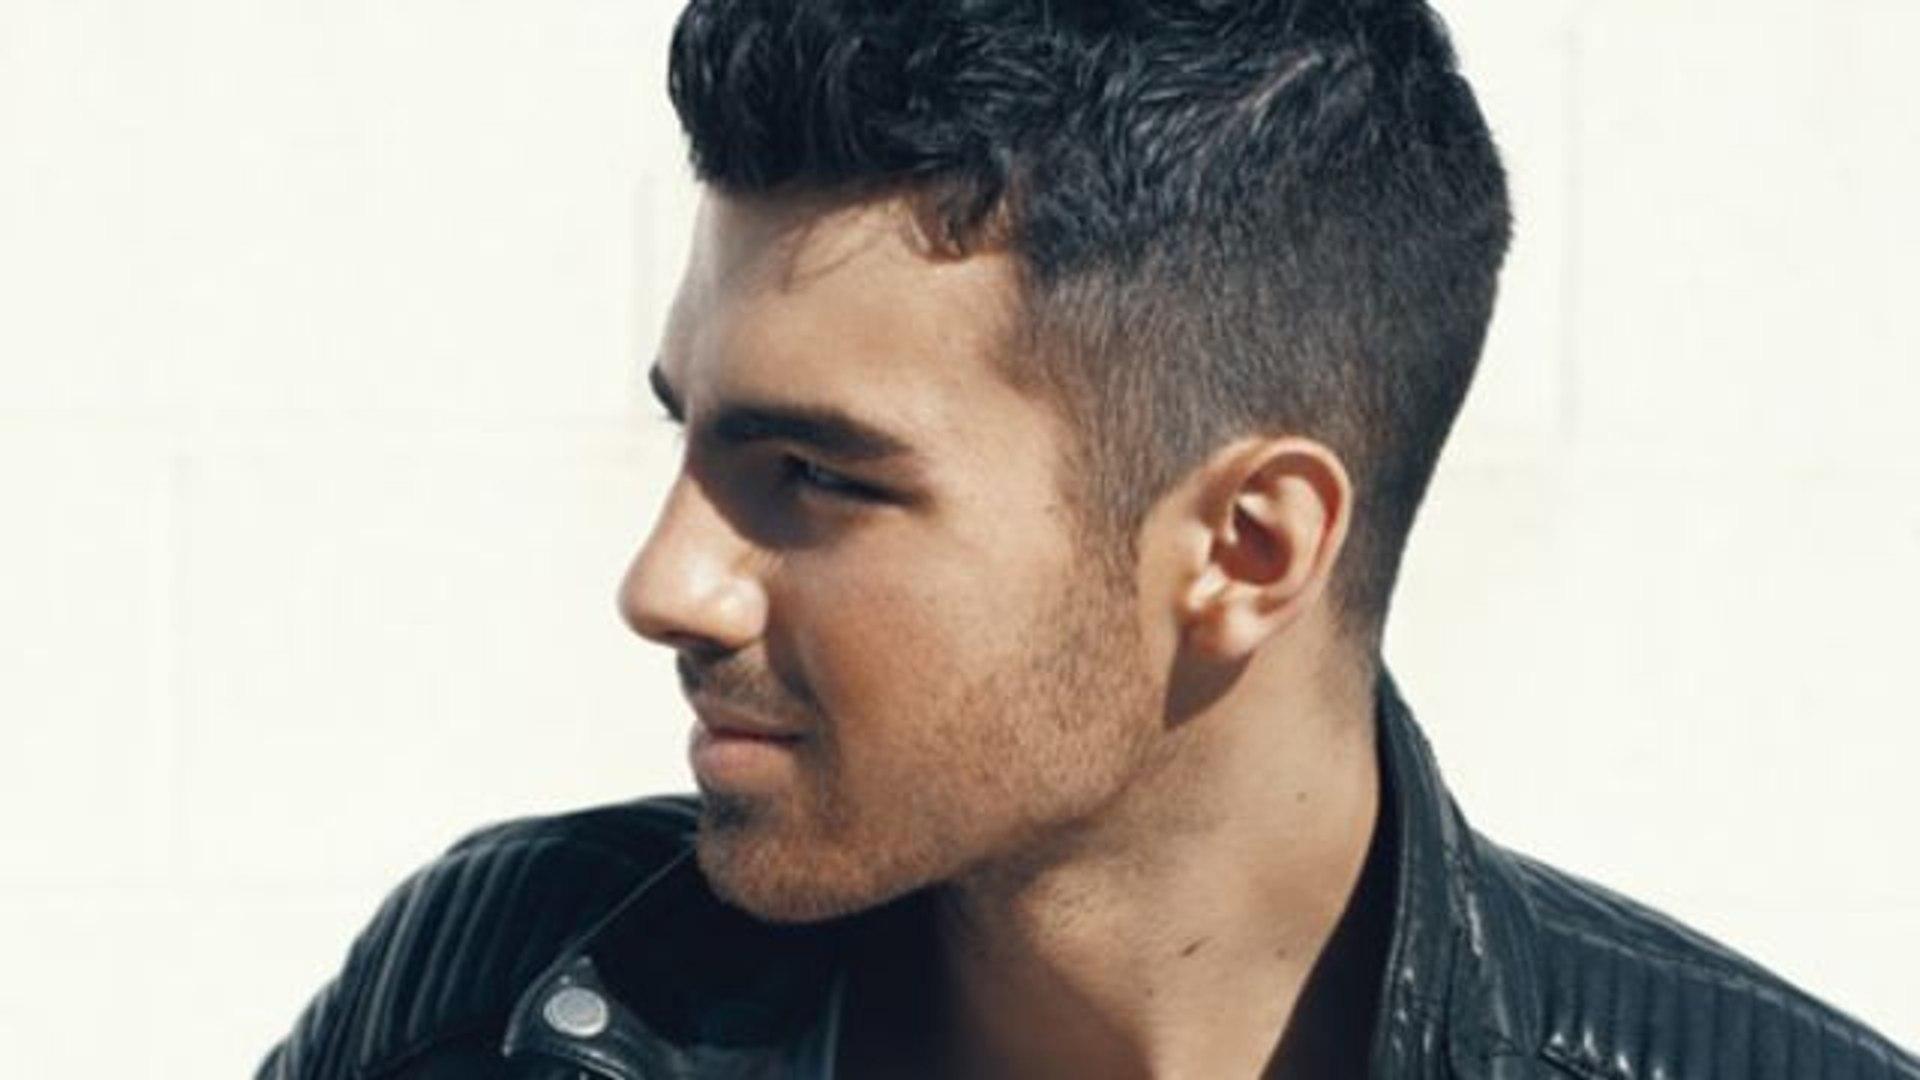 Joe Jonas: Behind the Scenes